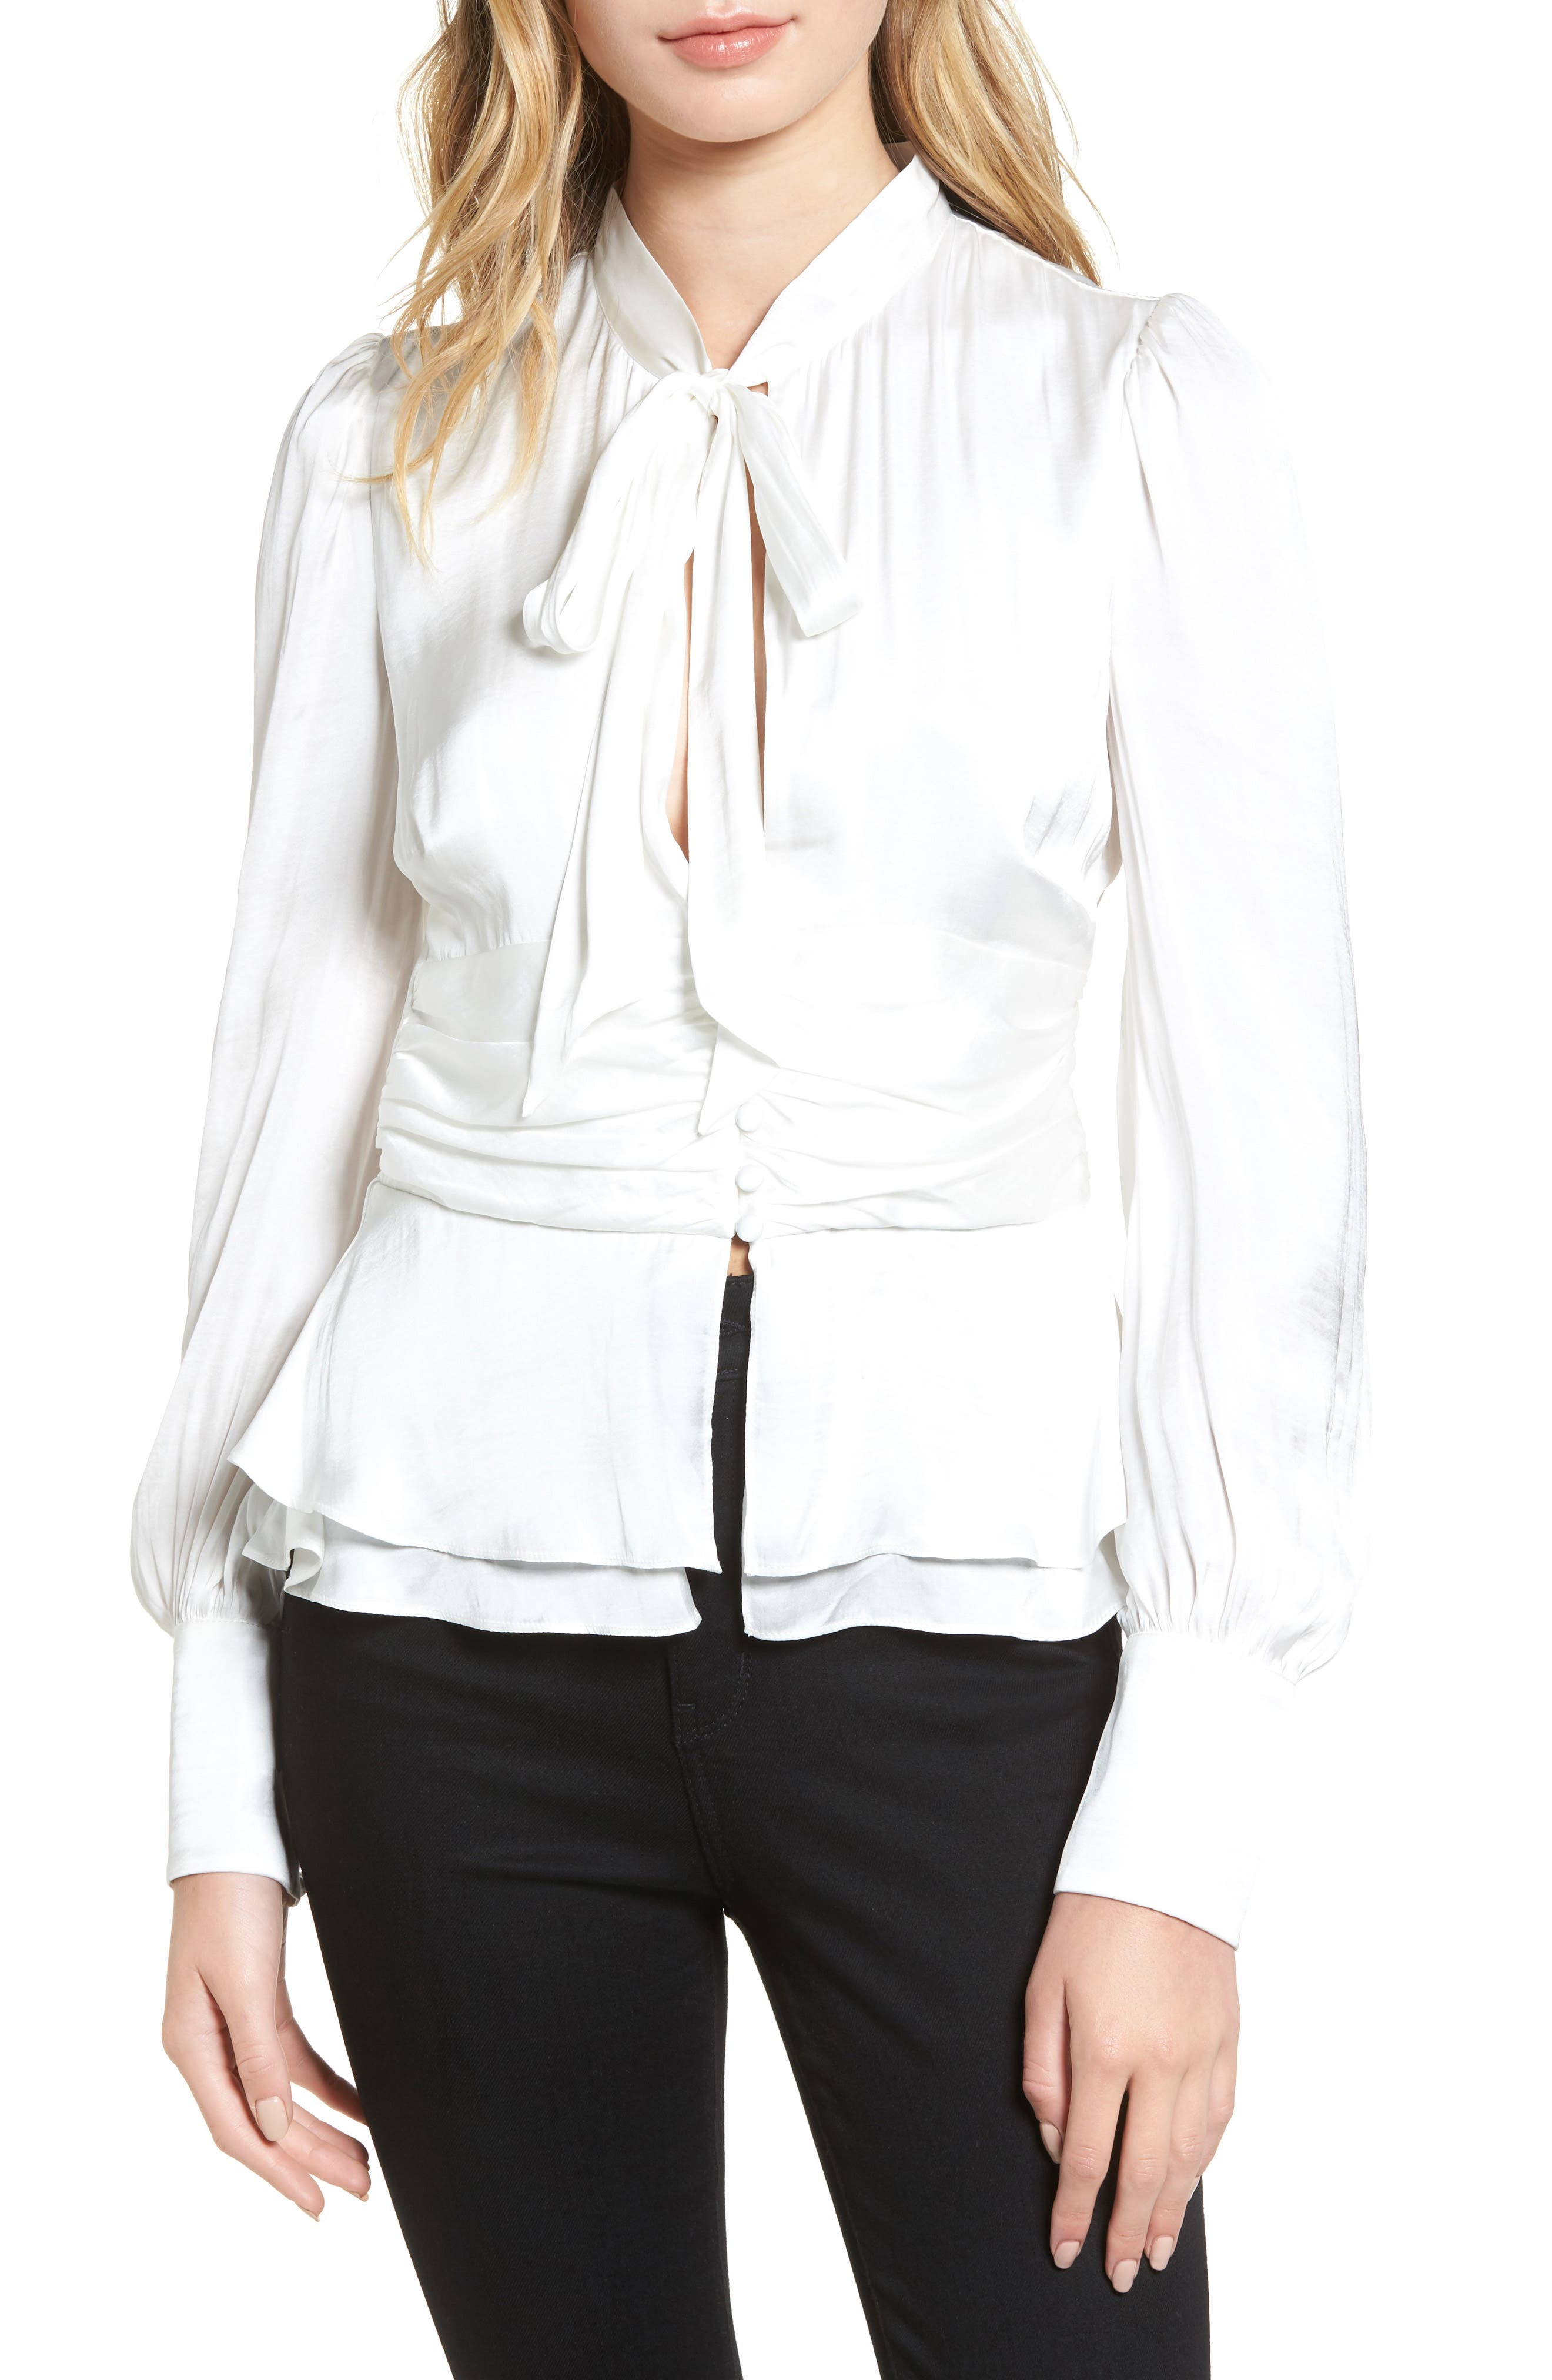 Bardot Tie Front Blouse